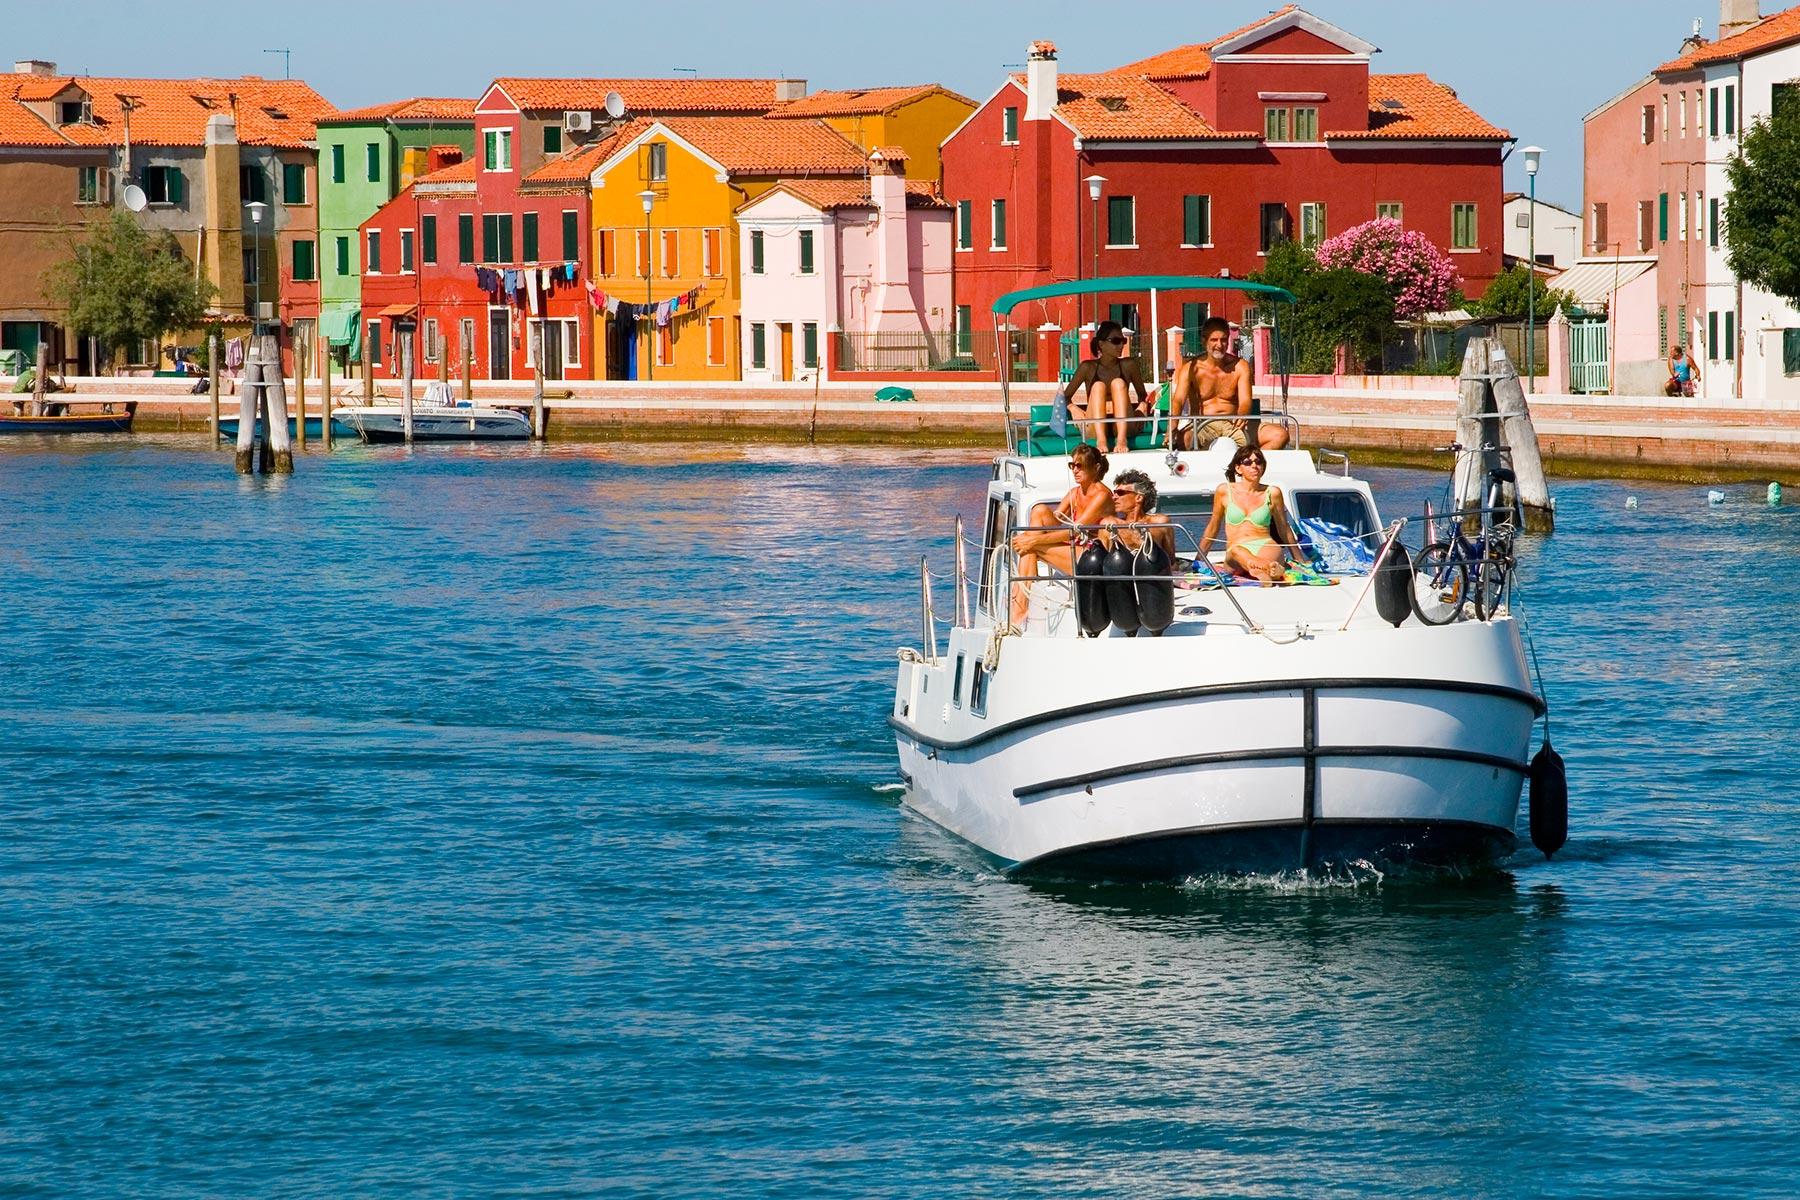 Barca abitabile houseboat Burano vacanza case colorate